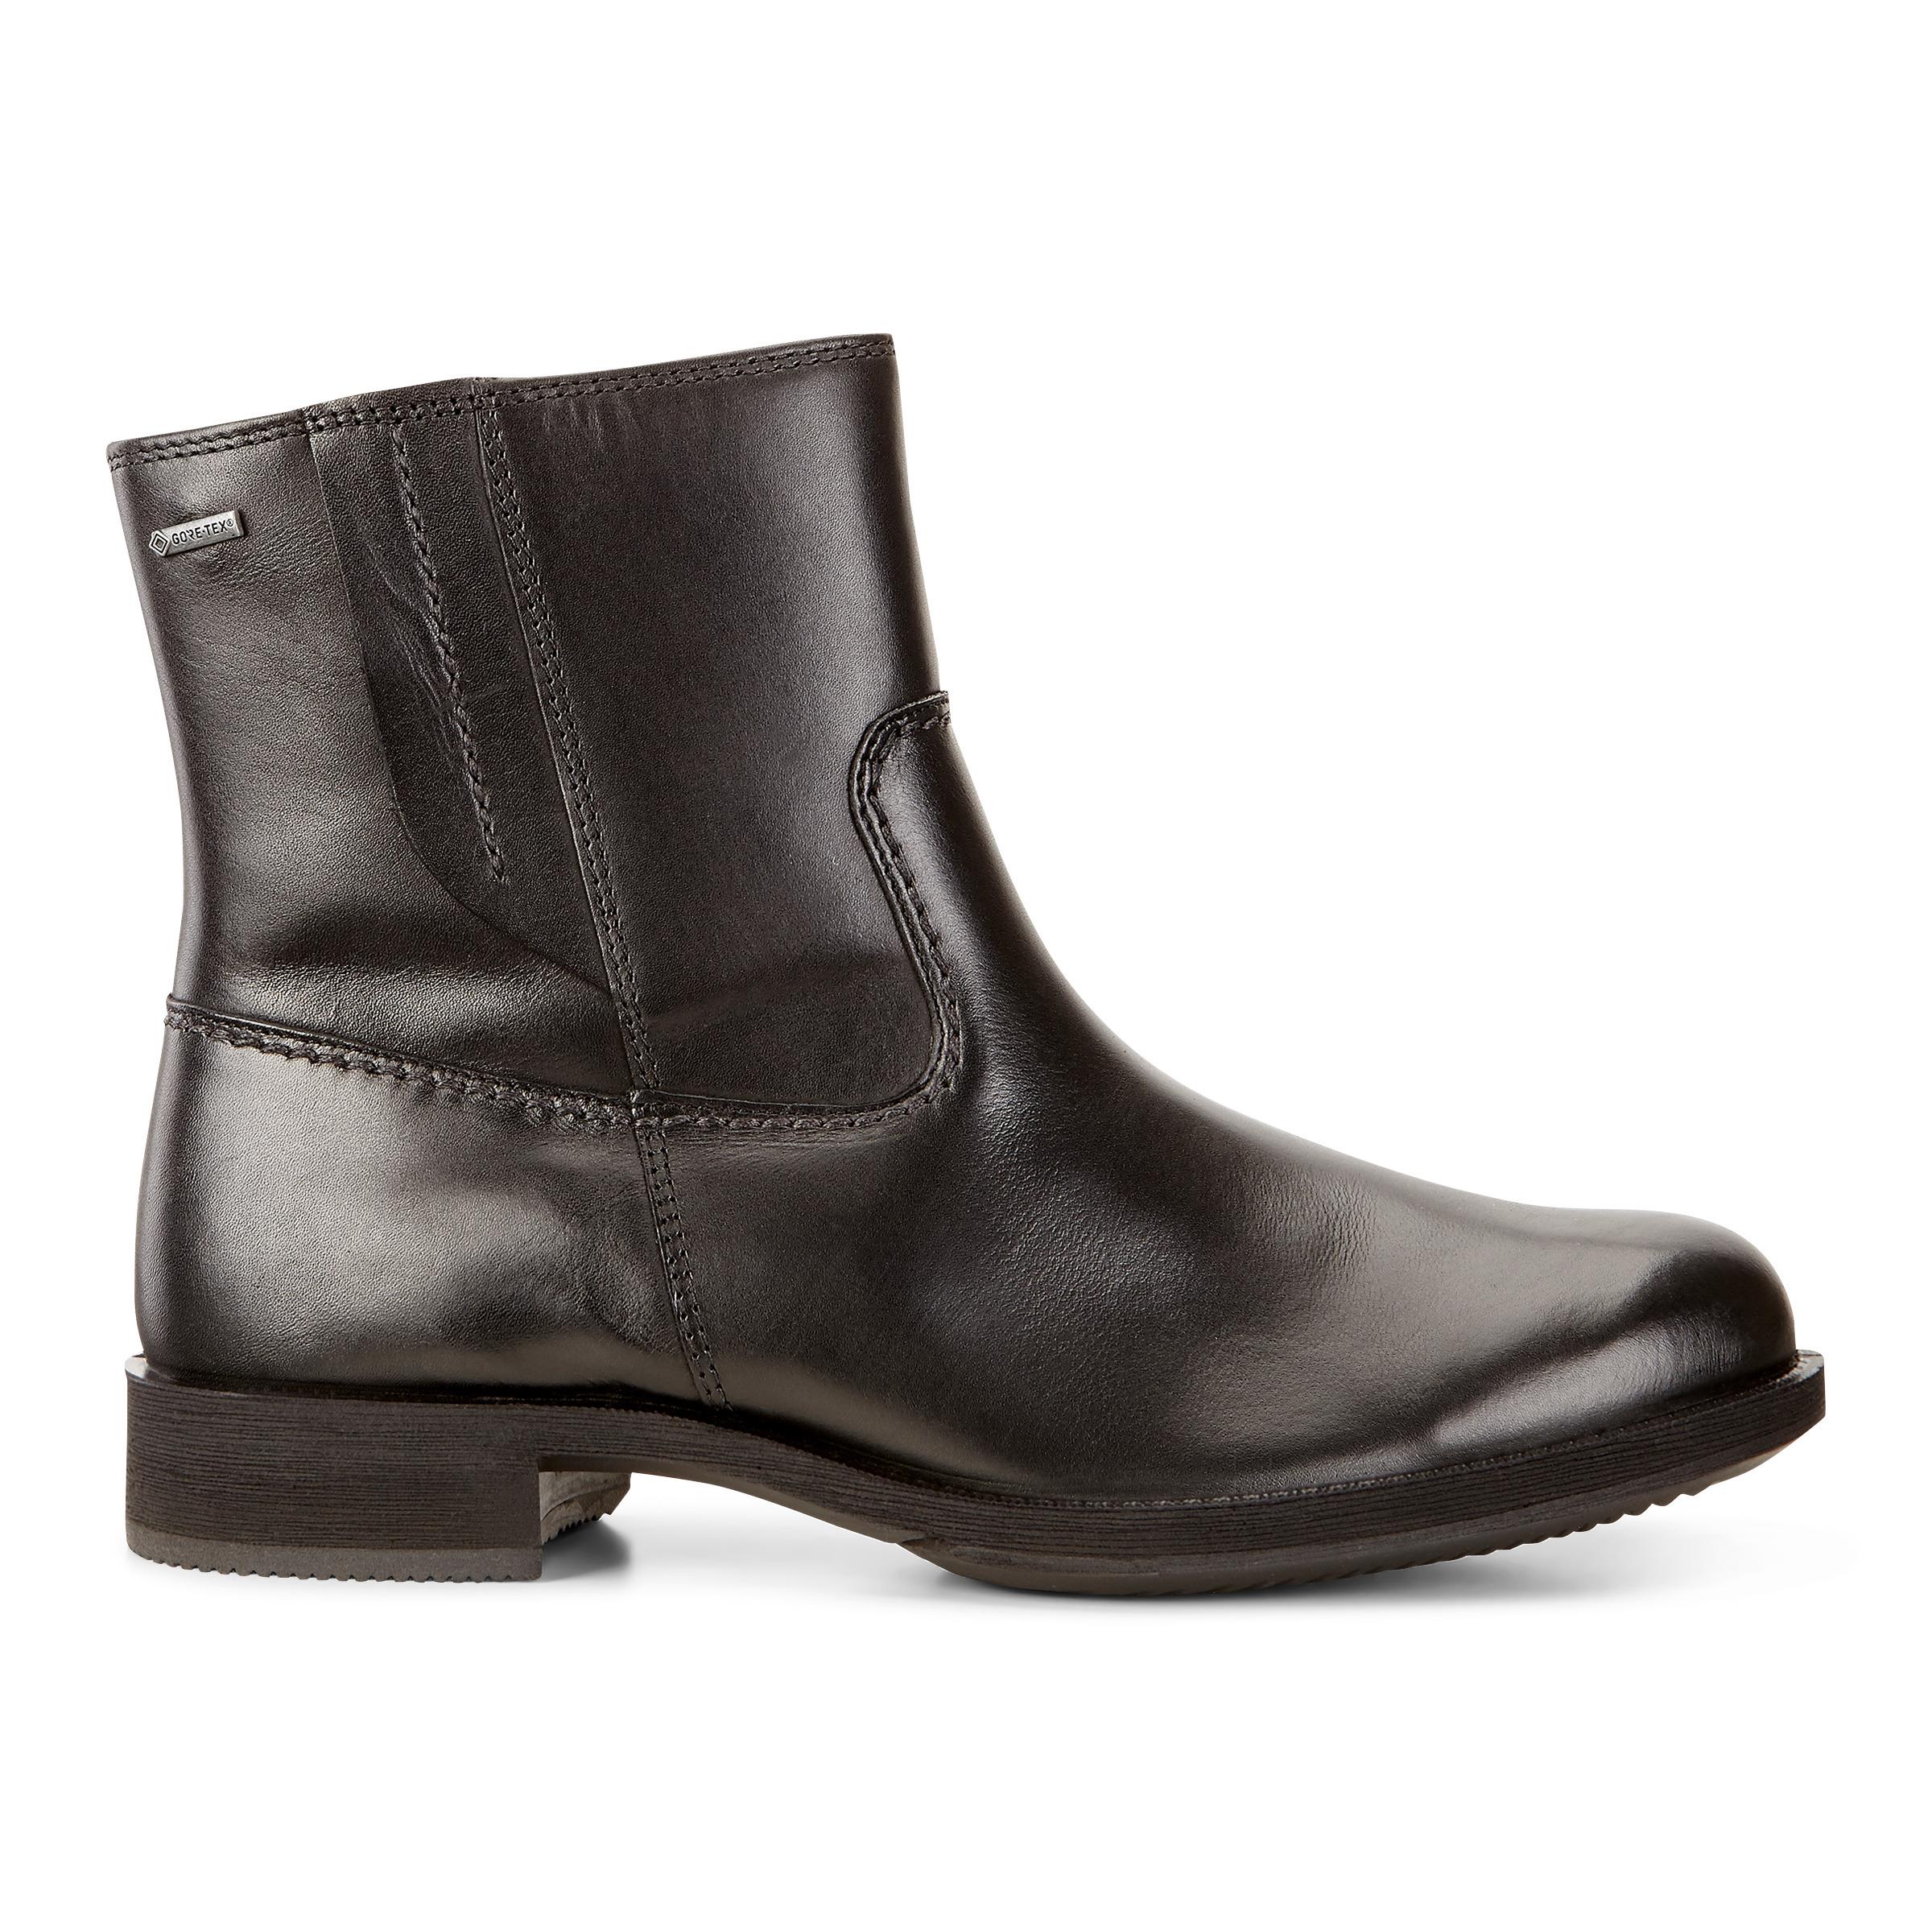 Ecco 234743 Saunter Black, Schuhe, Stiefel & Boots, Hohe Boots, Schwarz, Female, 36